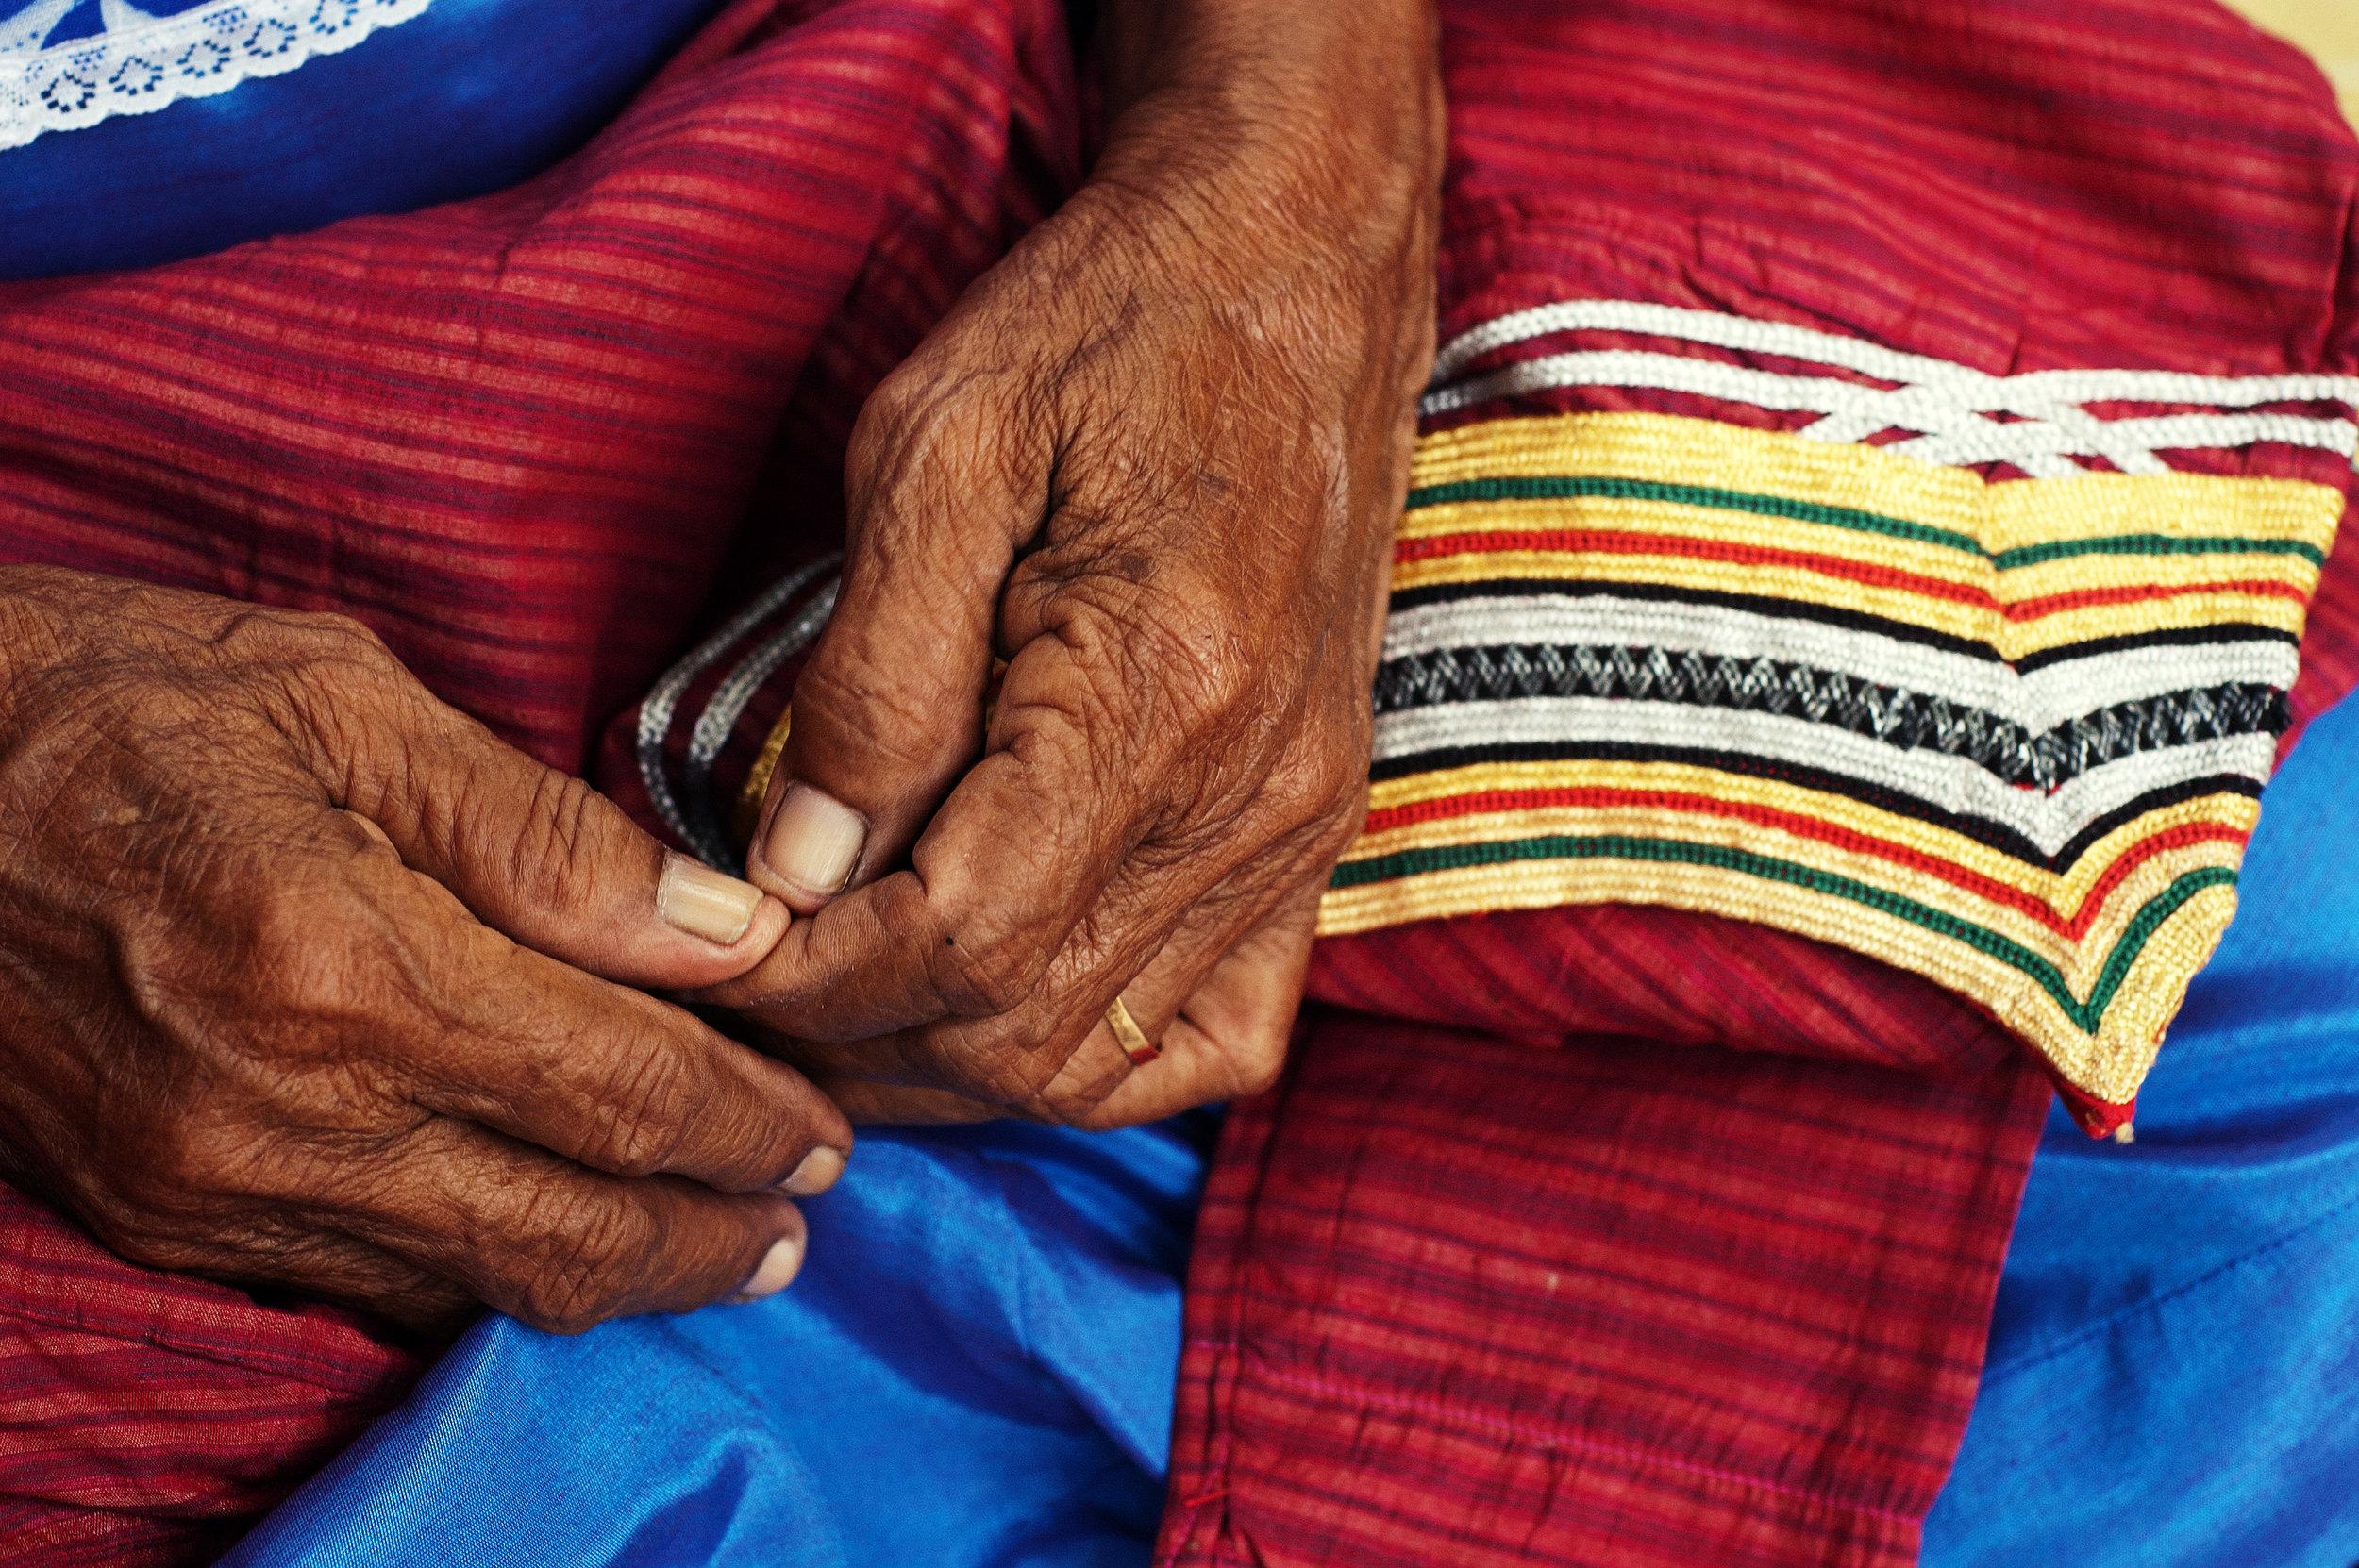 Maldives. Nikon D70s. (2009)